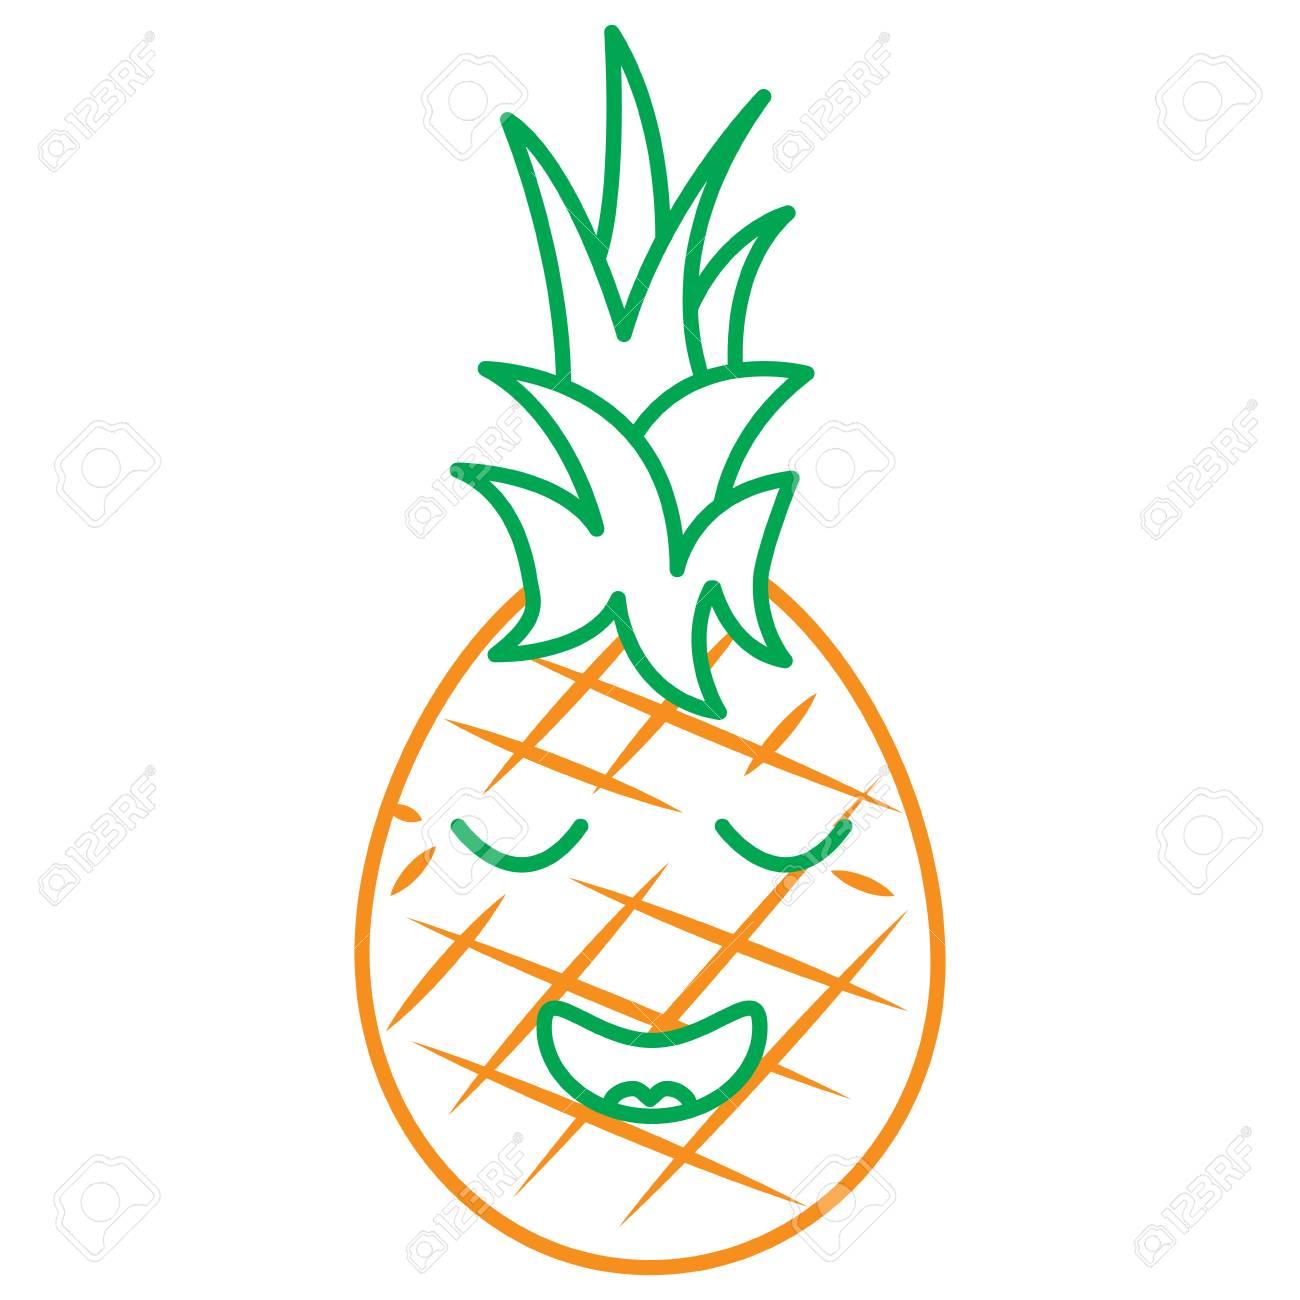 Kawaii Pineapple Fruit Cartoon Line Vector Illustration In Green